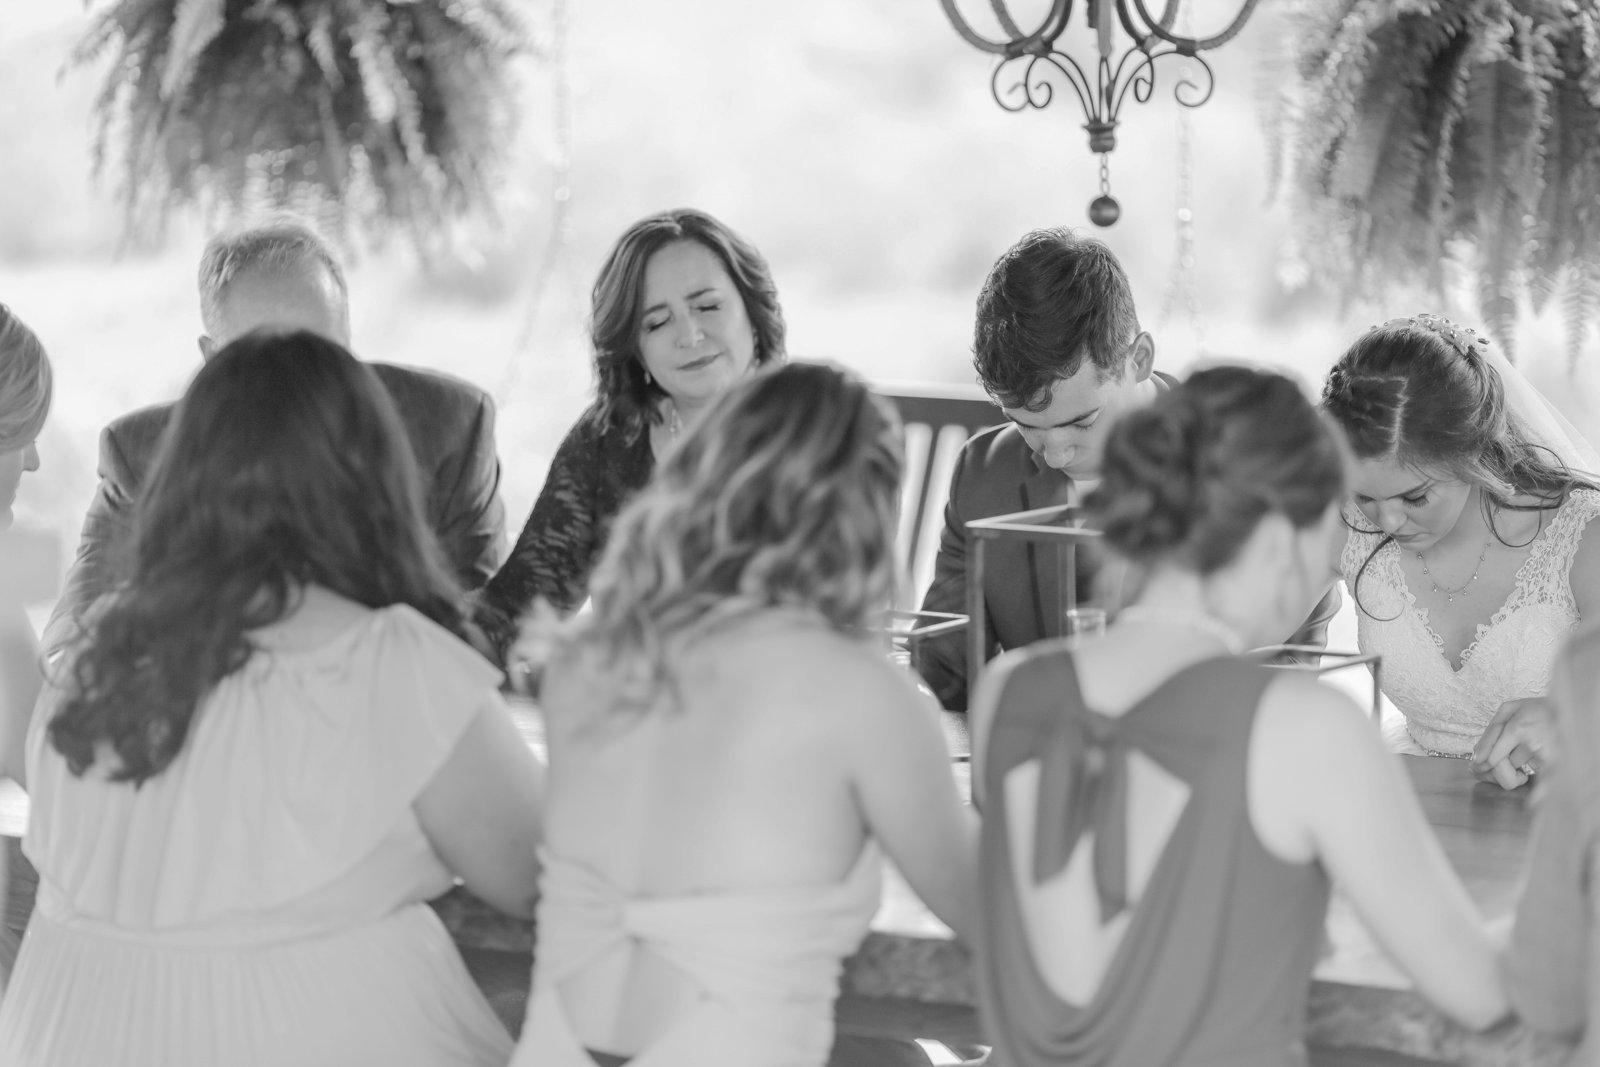 wedding_photographer_Missouri_Destination_elope_intimate_Saint_James_MO_Missouri_KansasCity_Jeff_City_Jefferson_Columbia_Engagement_Photos_Pictures_Session_Best_Videographer_0204.jpg